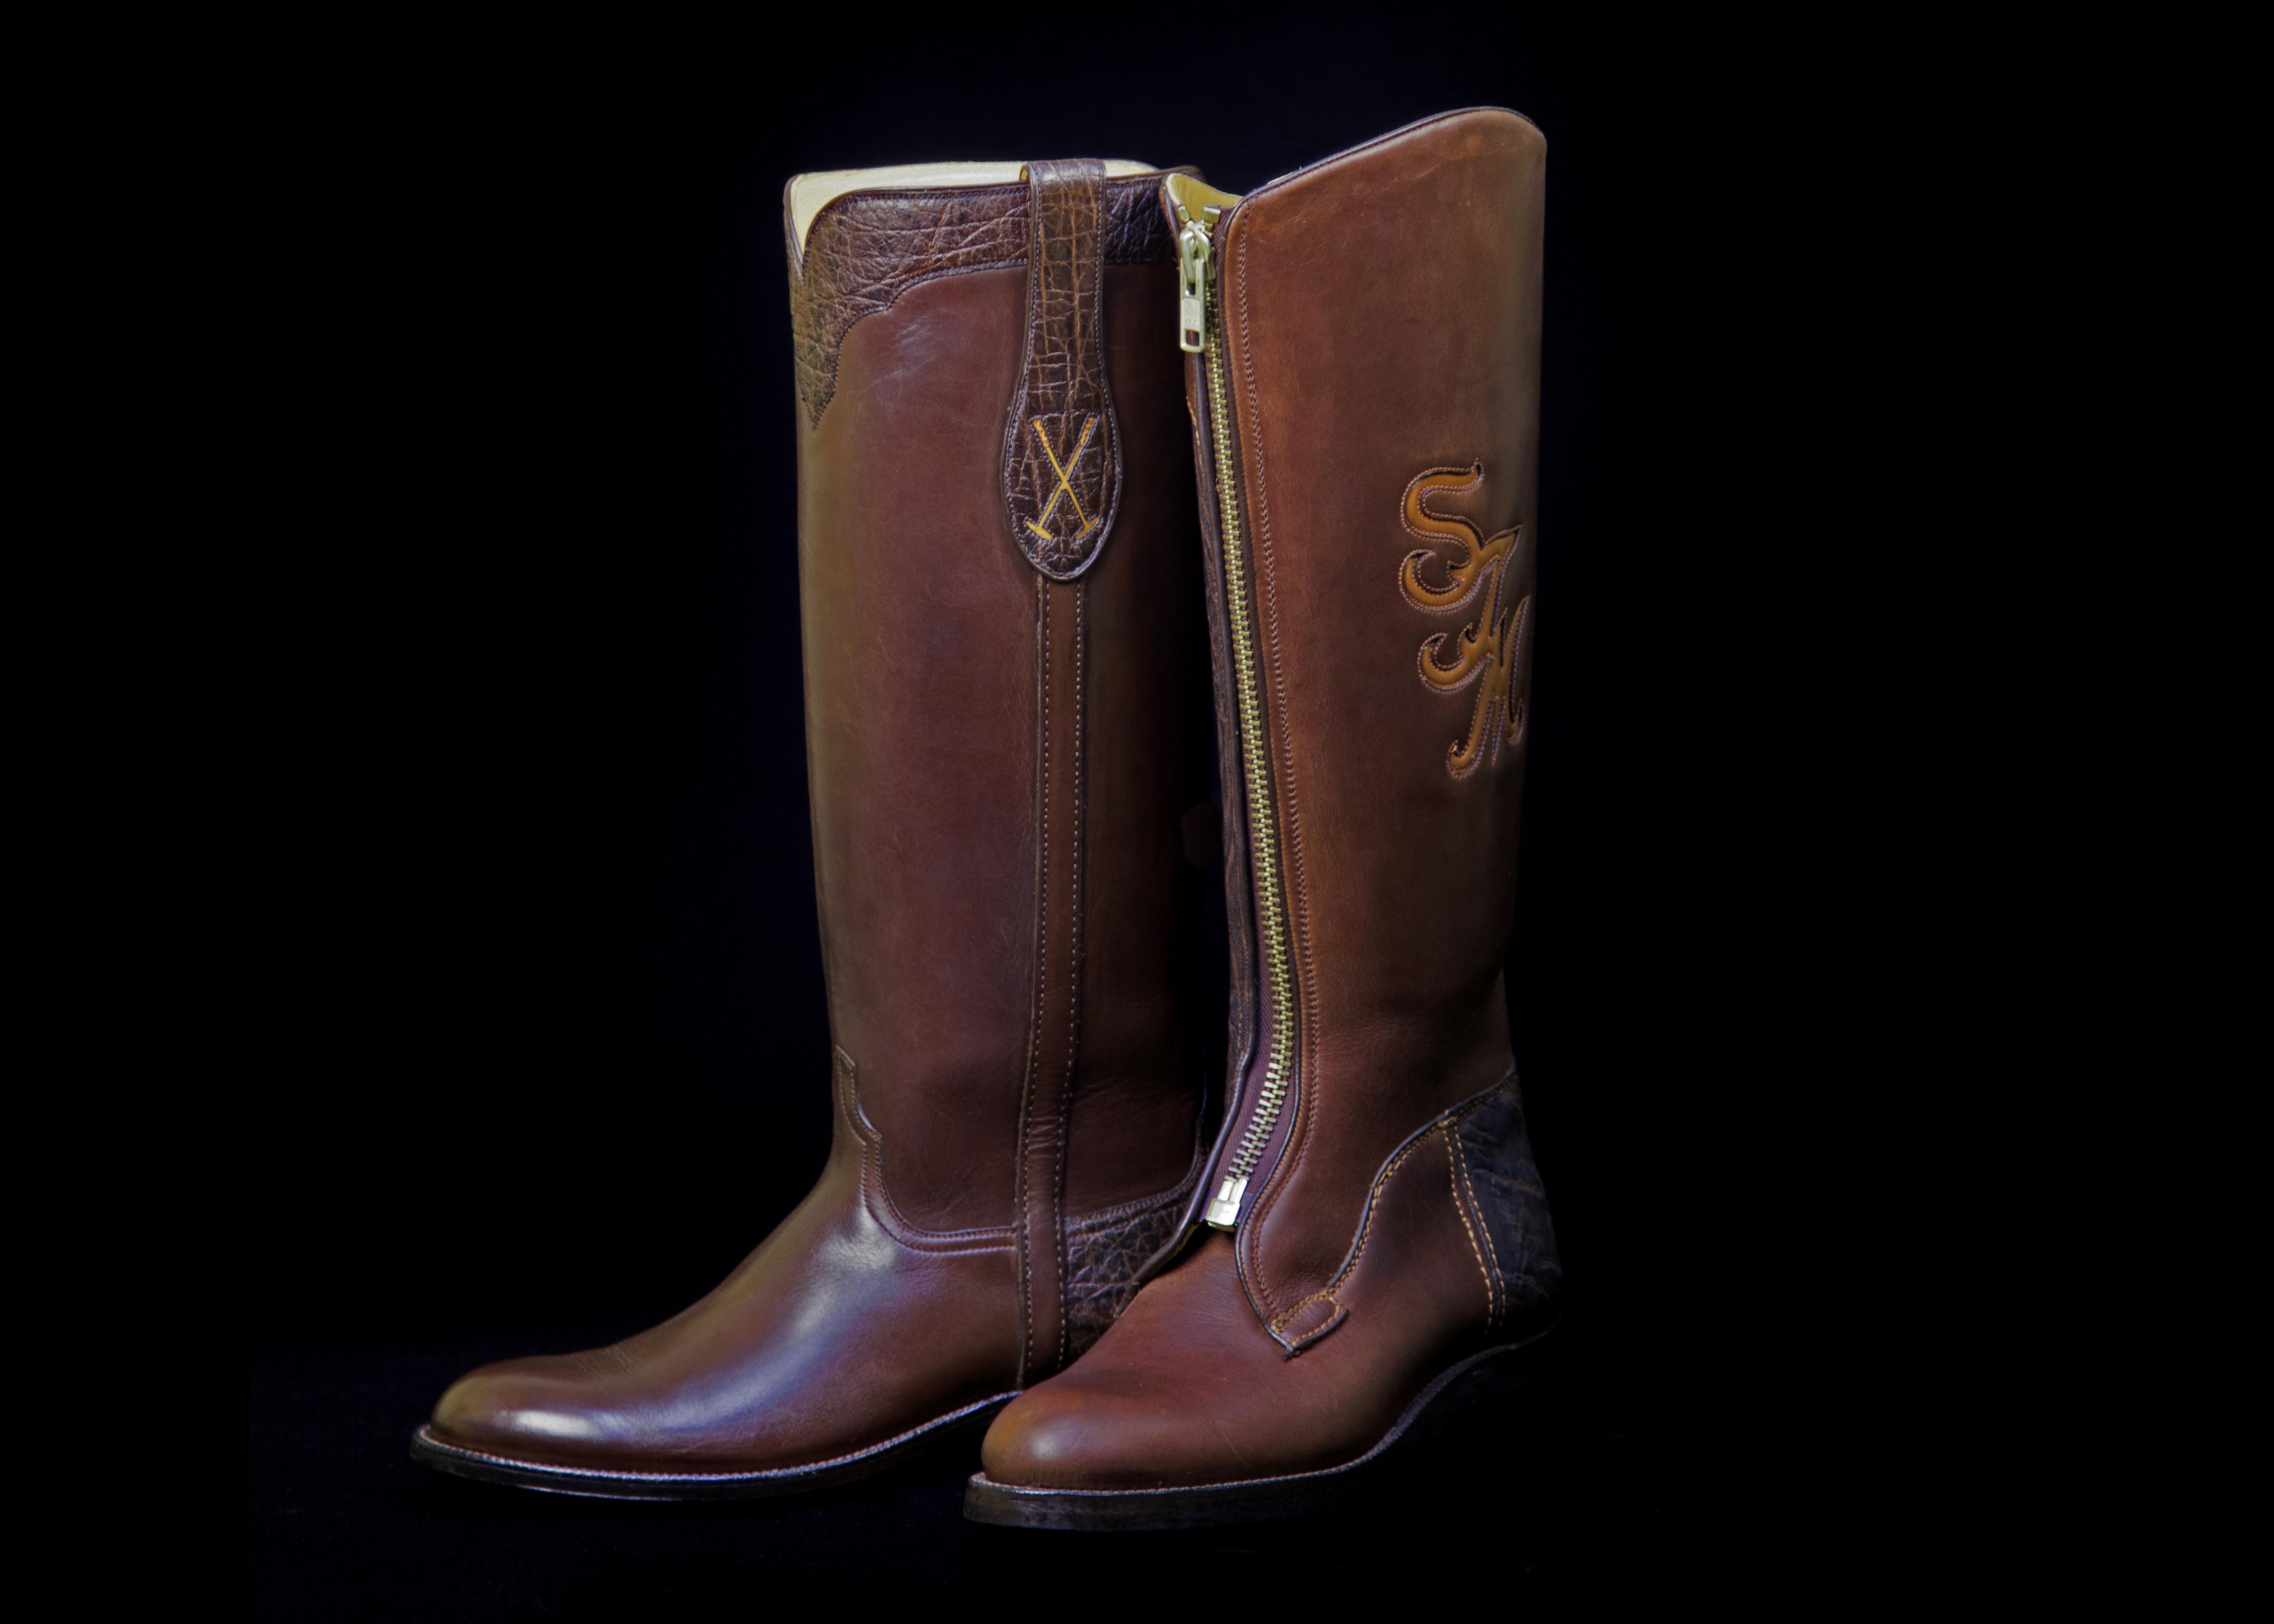 51d0fb91003f Polo and Riding Boots - Maida s Custom Footwear